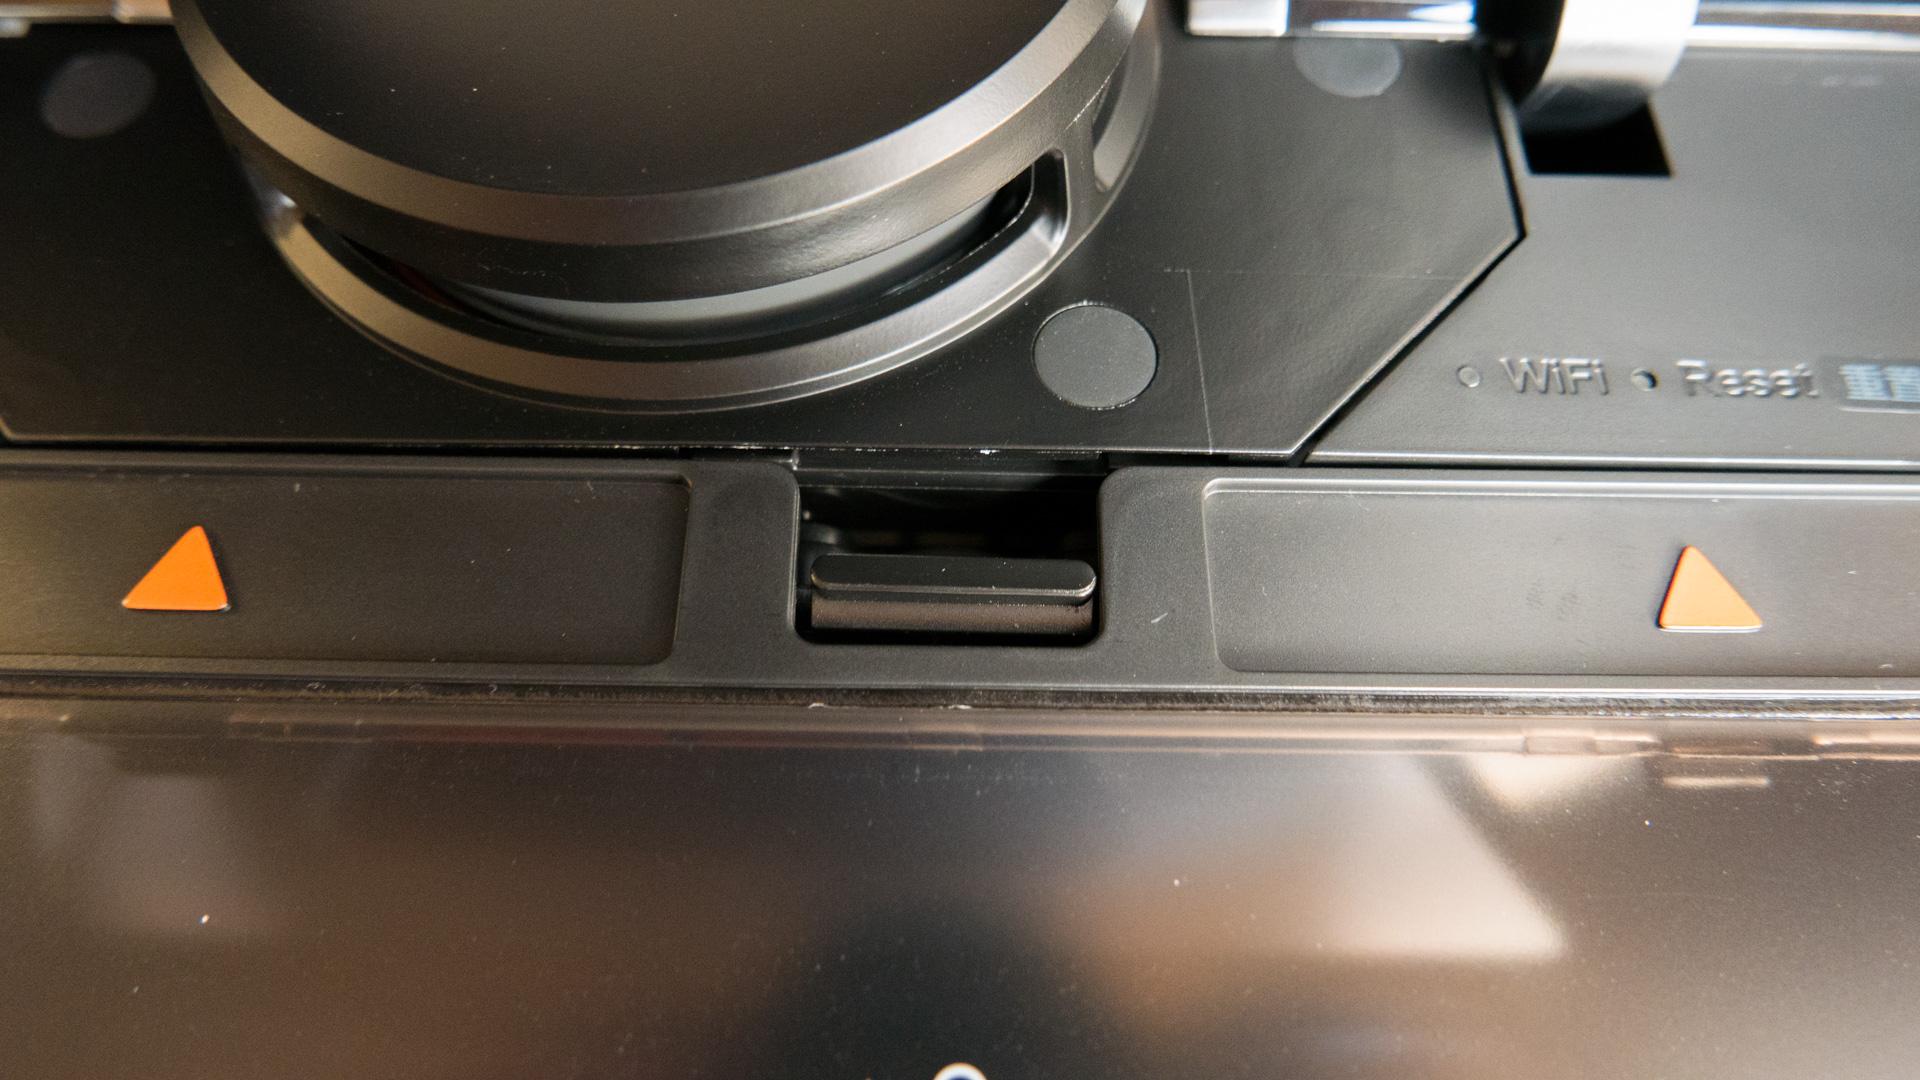 Xiaomi-roborock-S55-Details-35